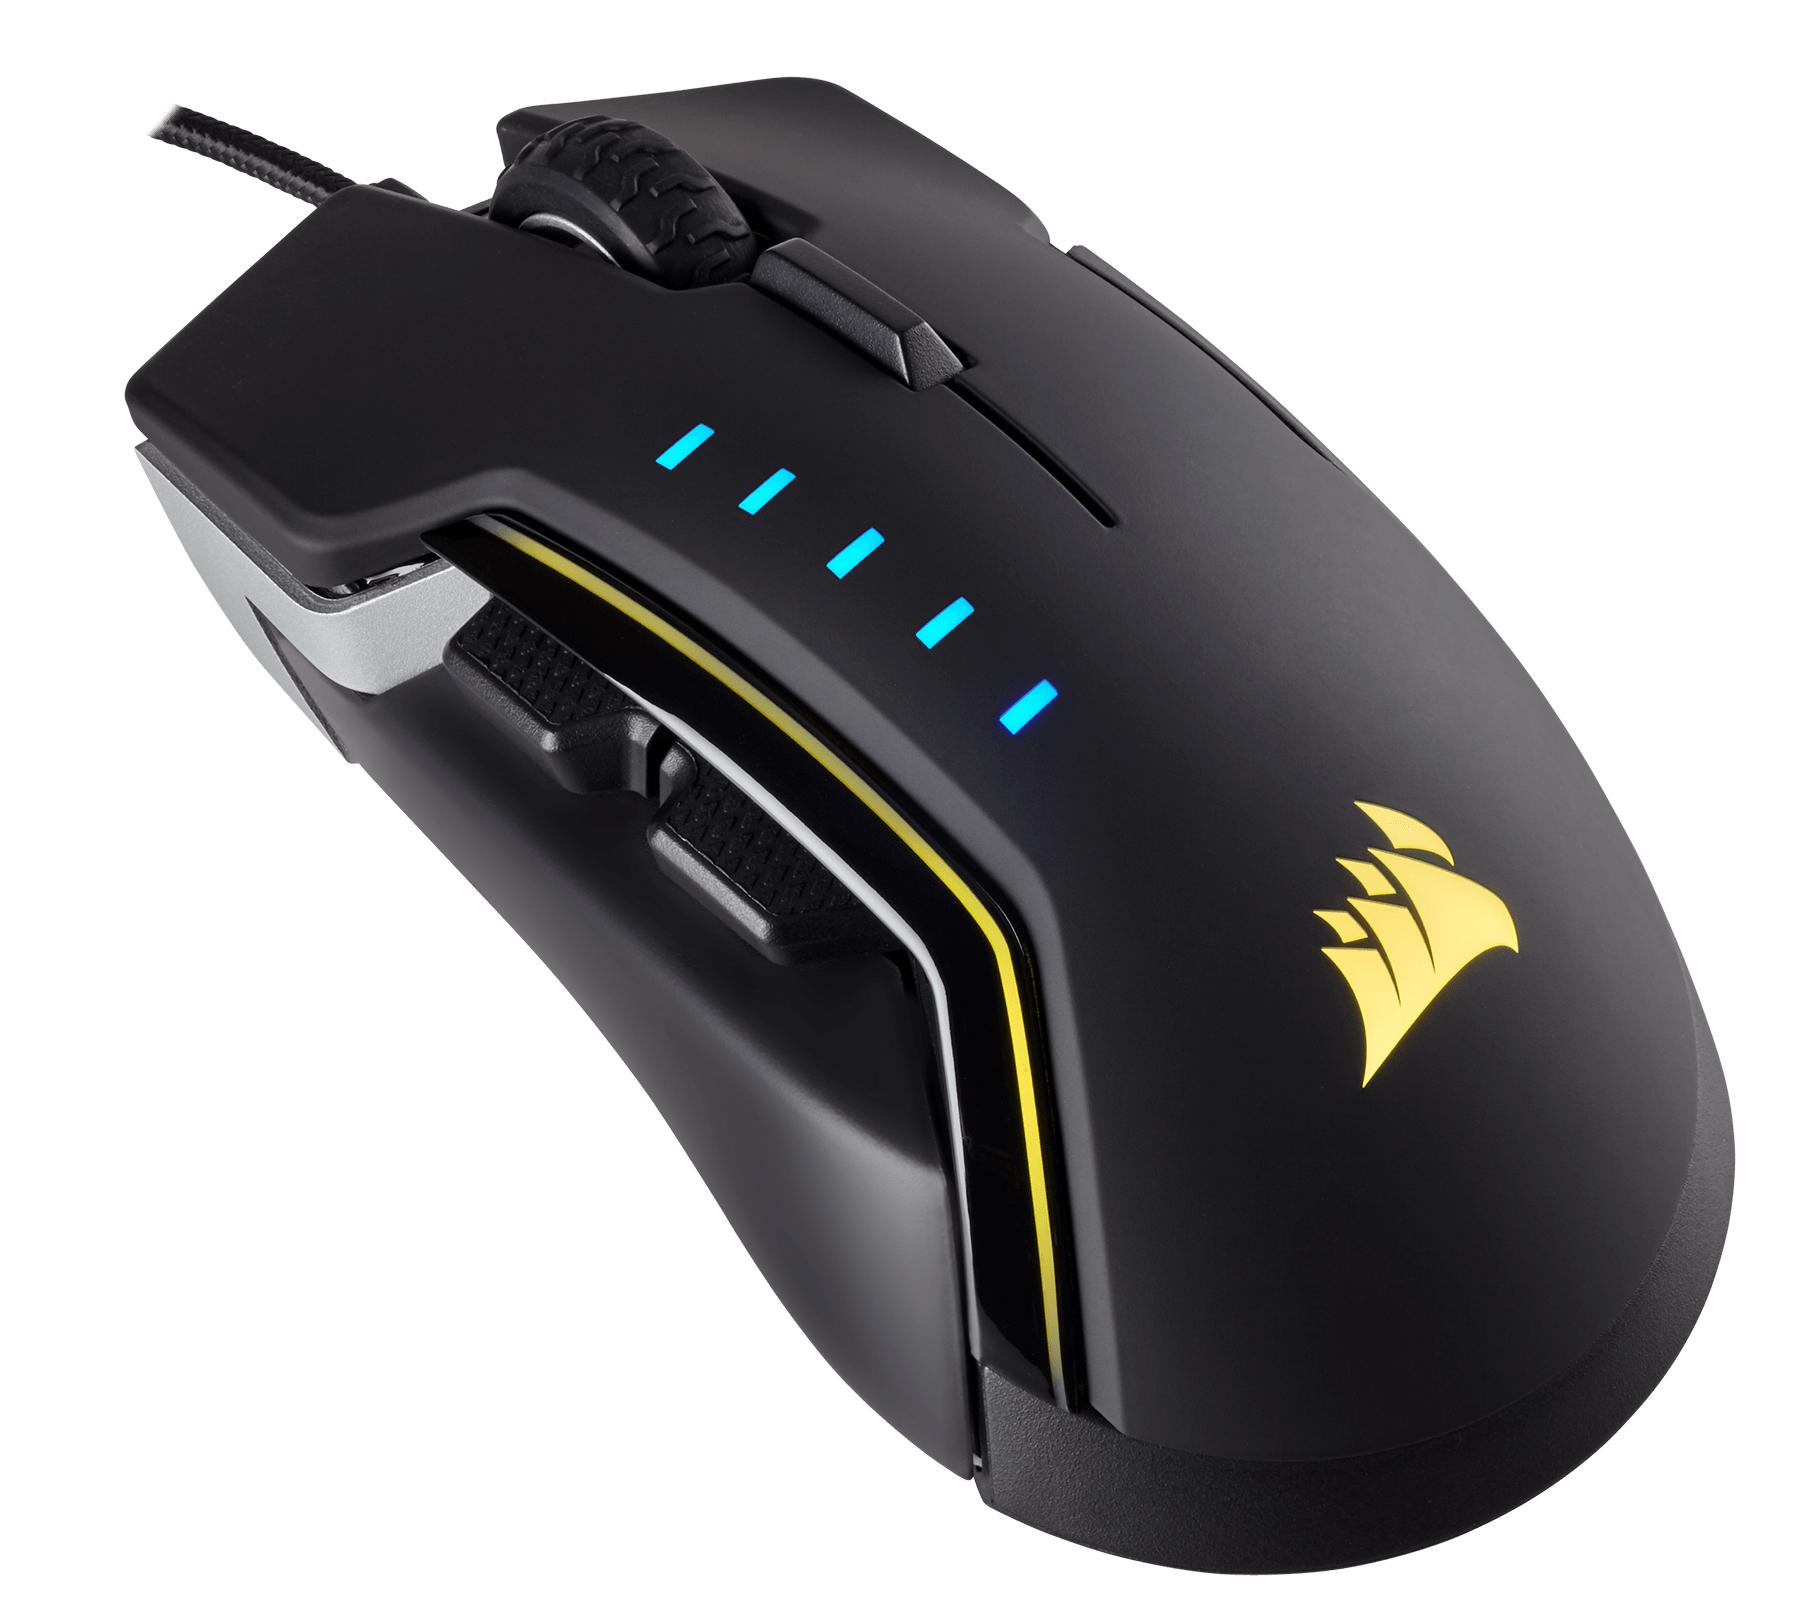 Corsair Glaive RGB Aluminum Gaming Mouse